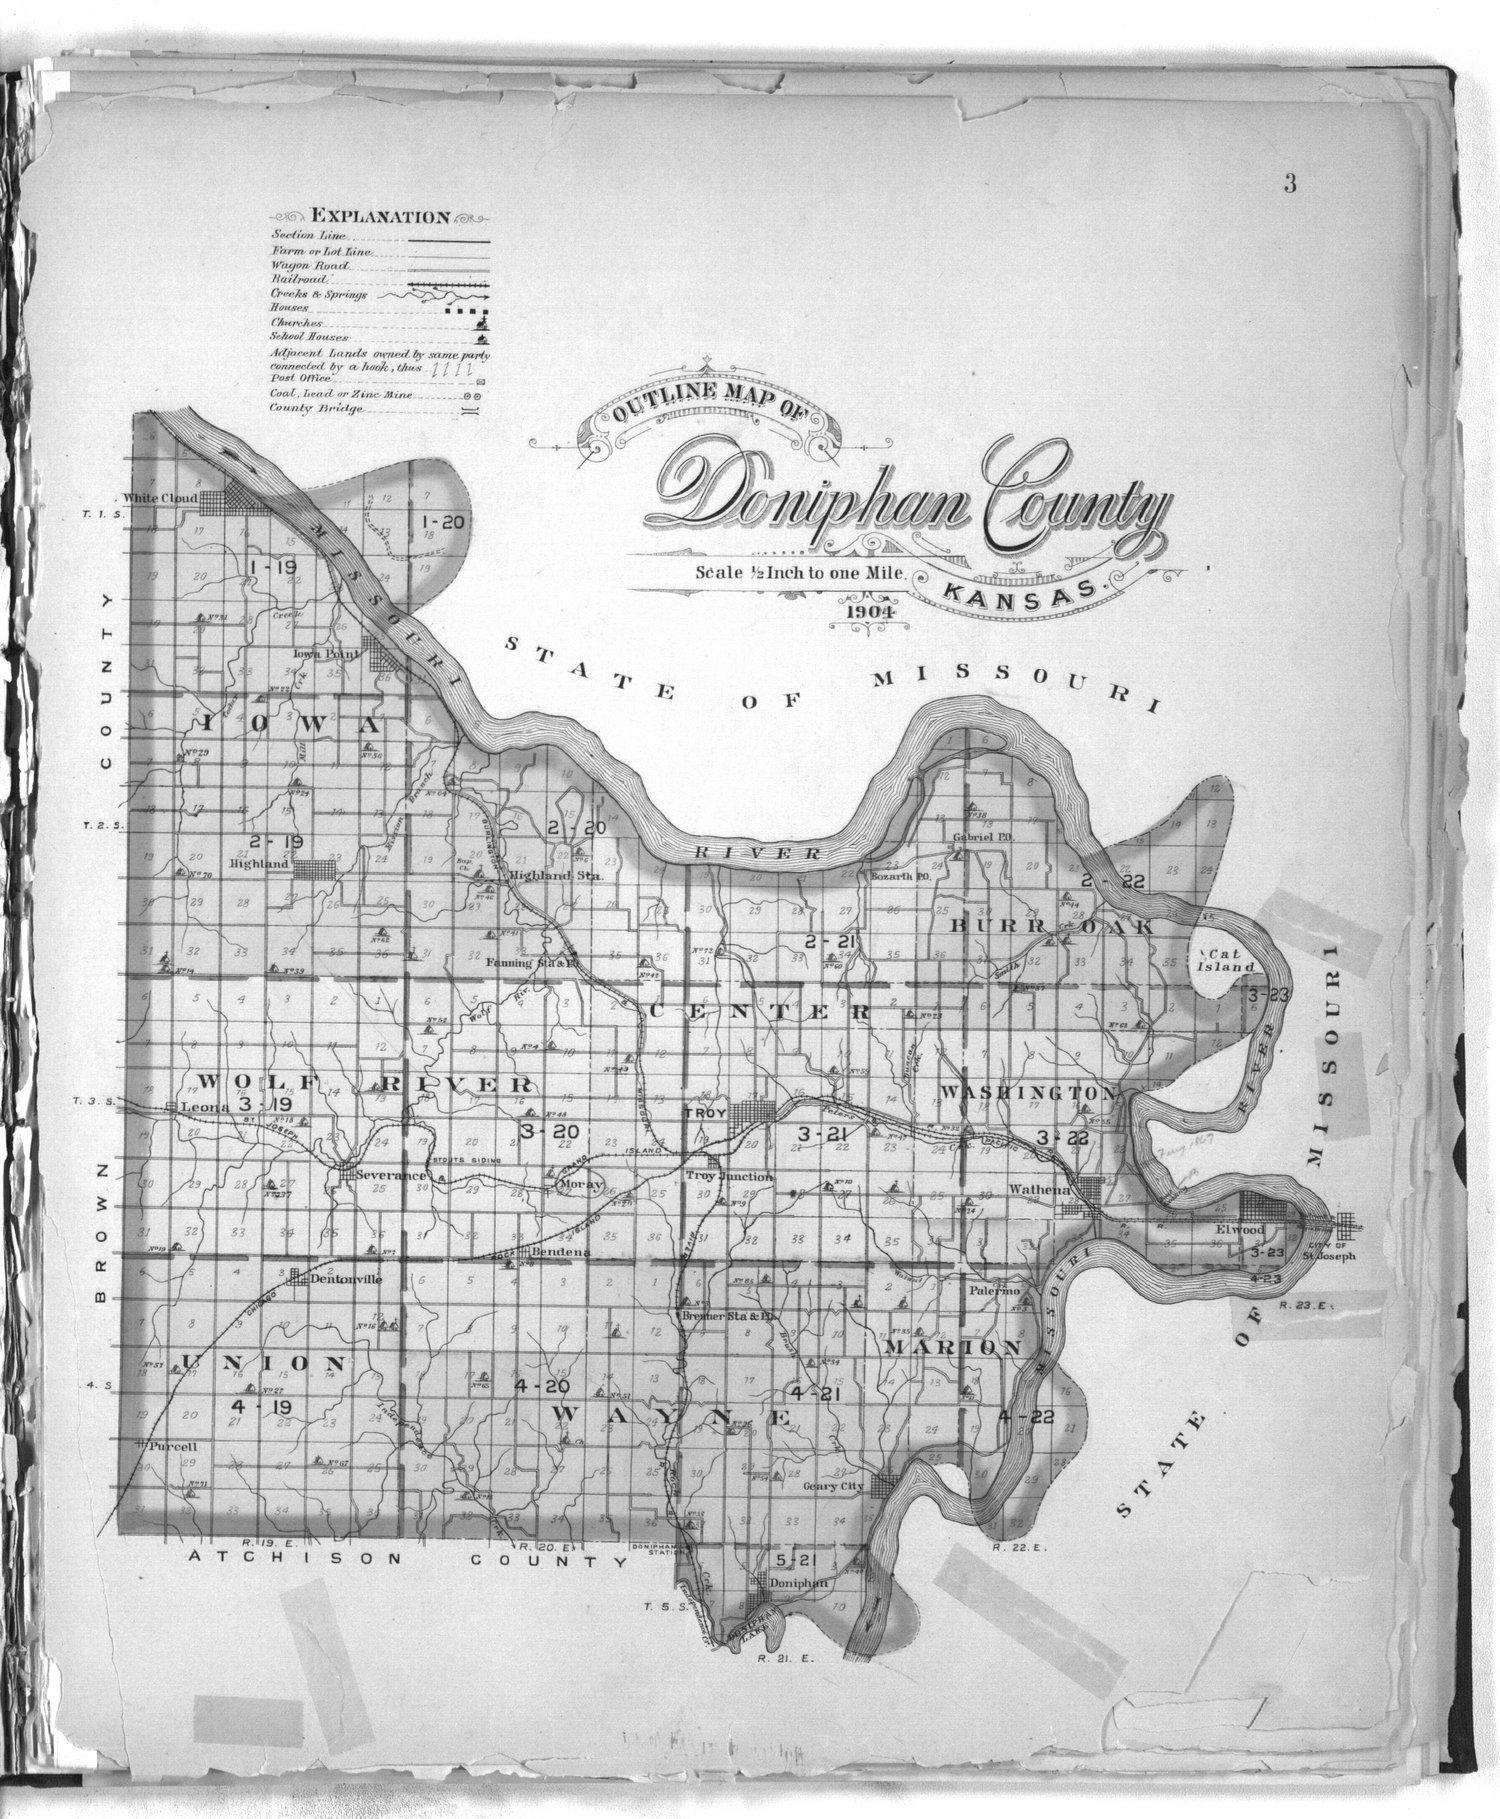 Plat book of Doniphan County, Kansas - 3